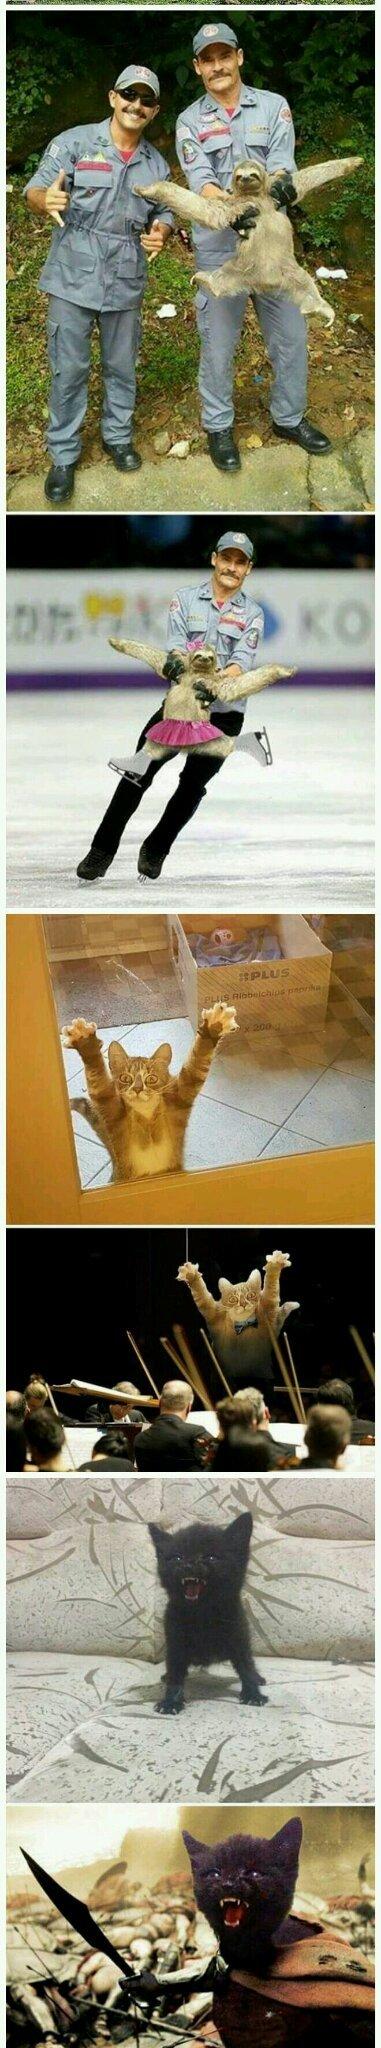 Toujours photoshop - meme